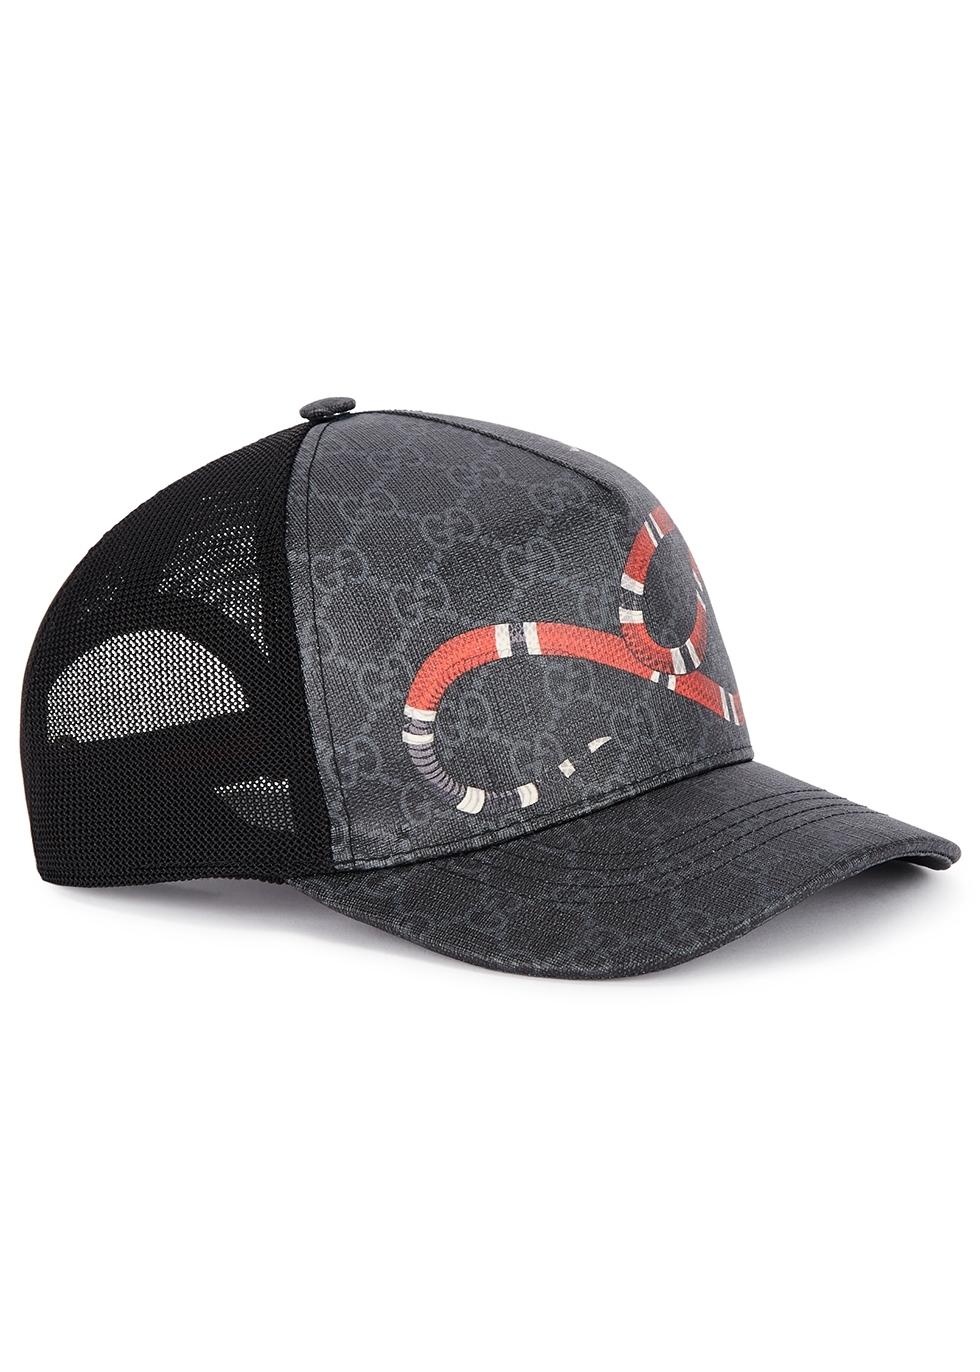 3b56bca3 Men's Designer Hats - Harvey Nichols